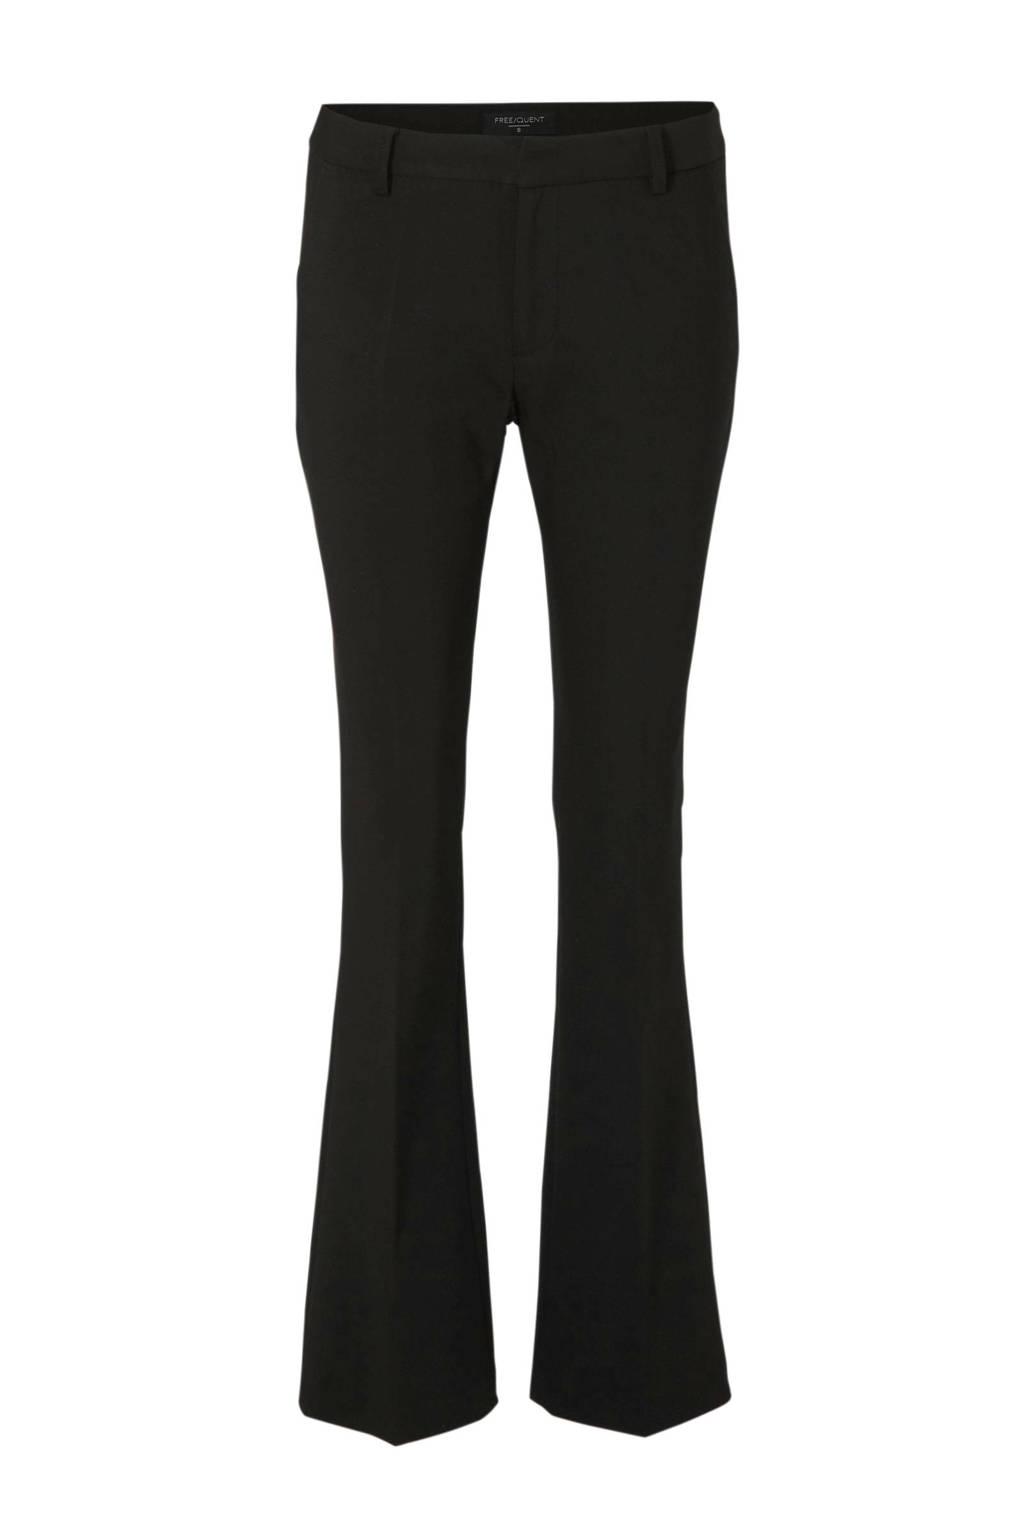 FREEQUENT straight fit pantalon zwart, Zwart